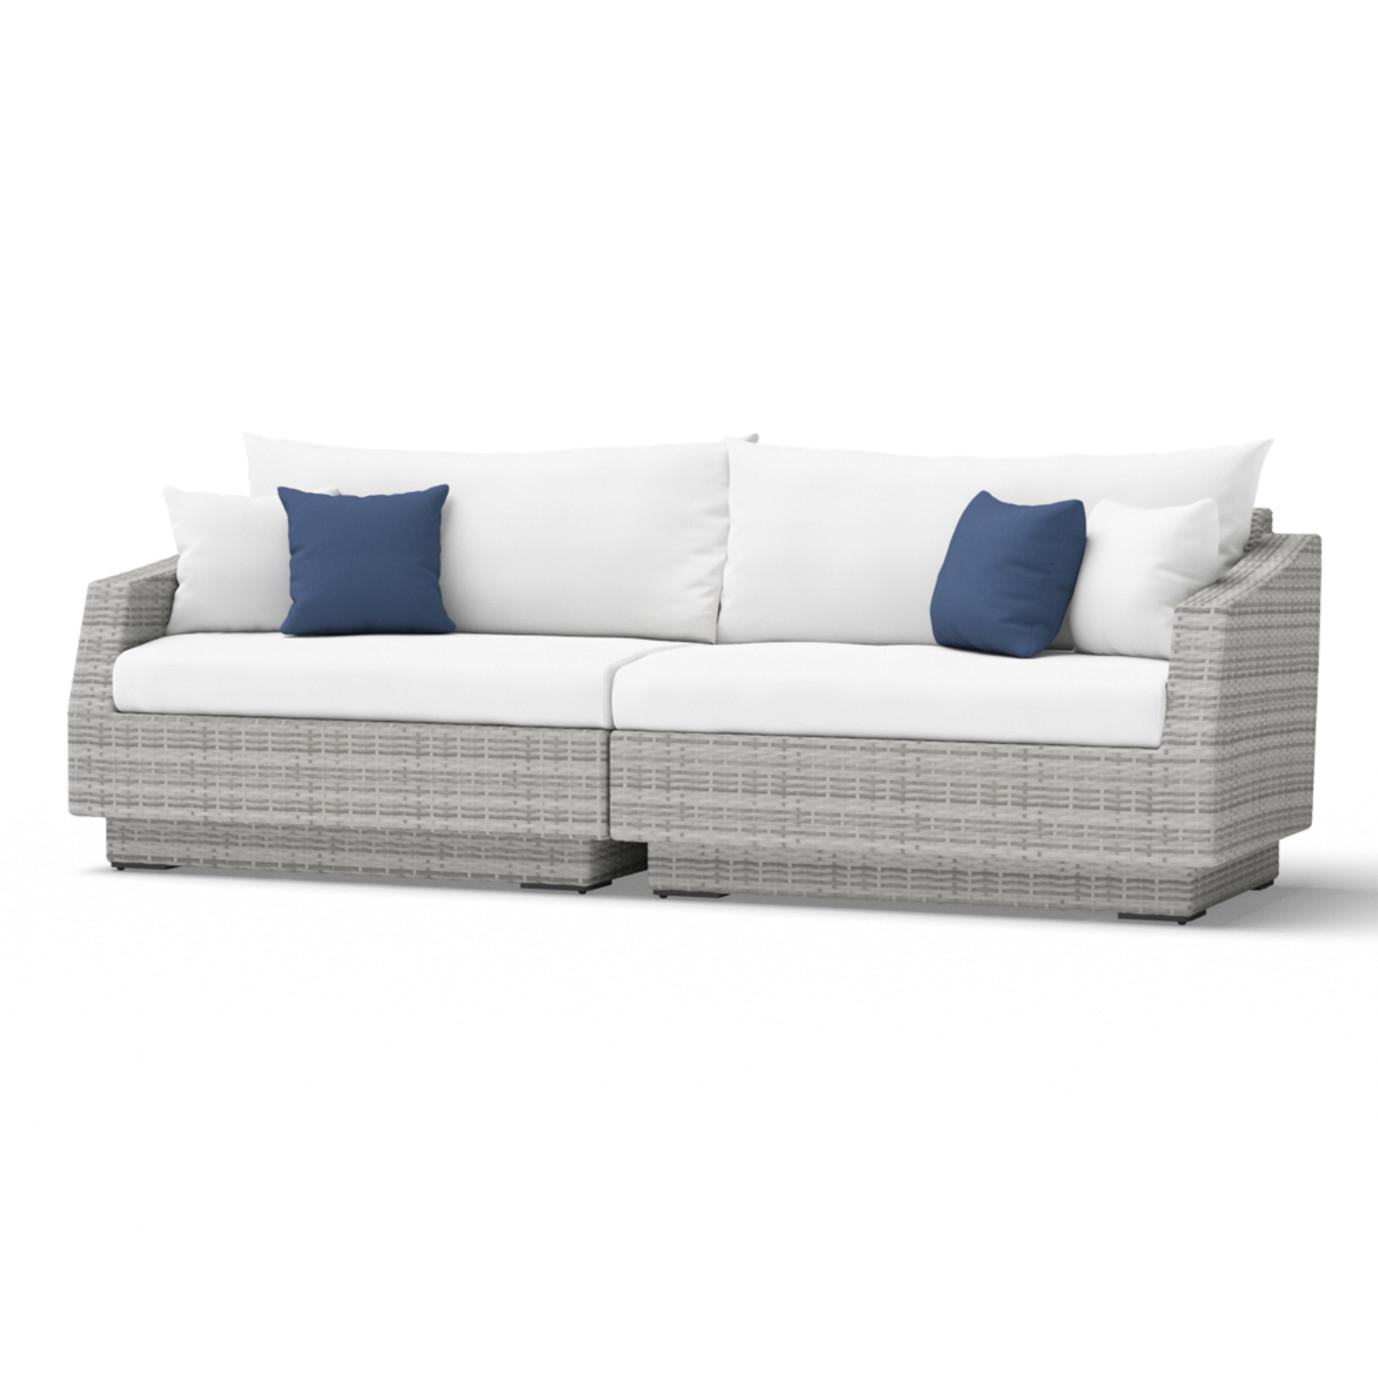 Cannes™ Sofa